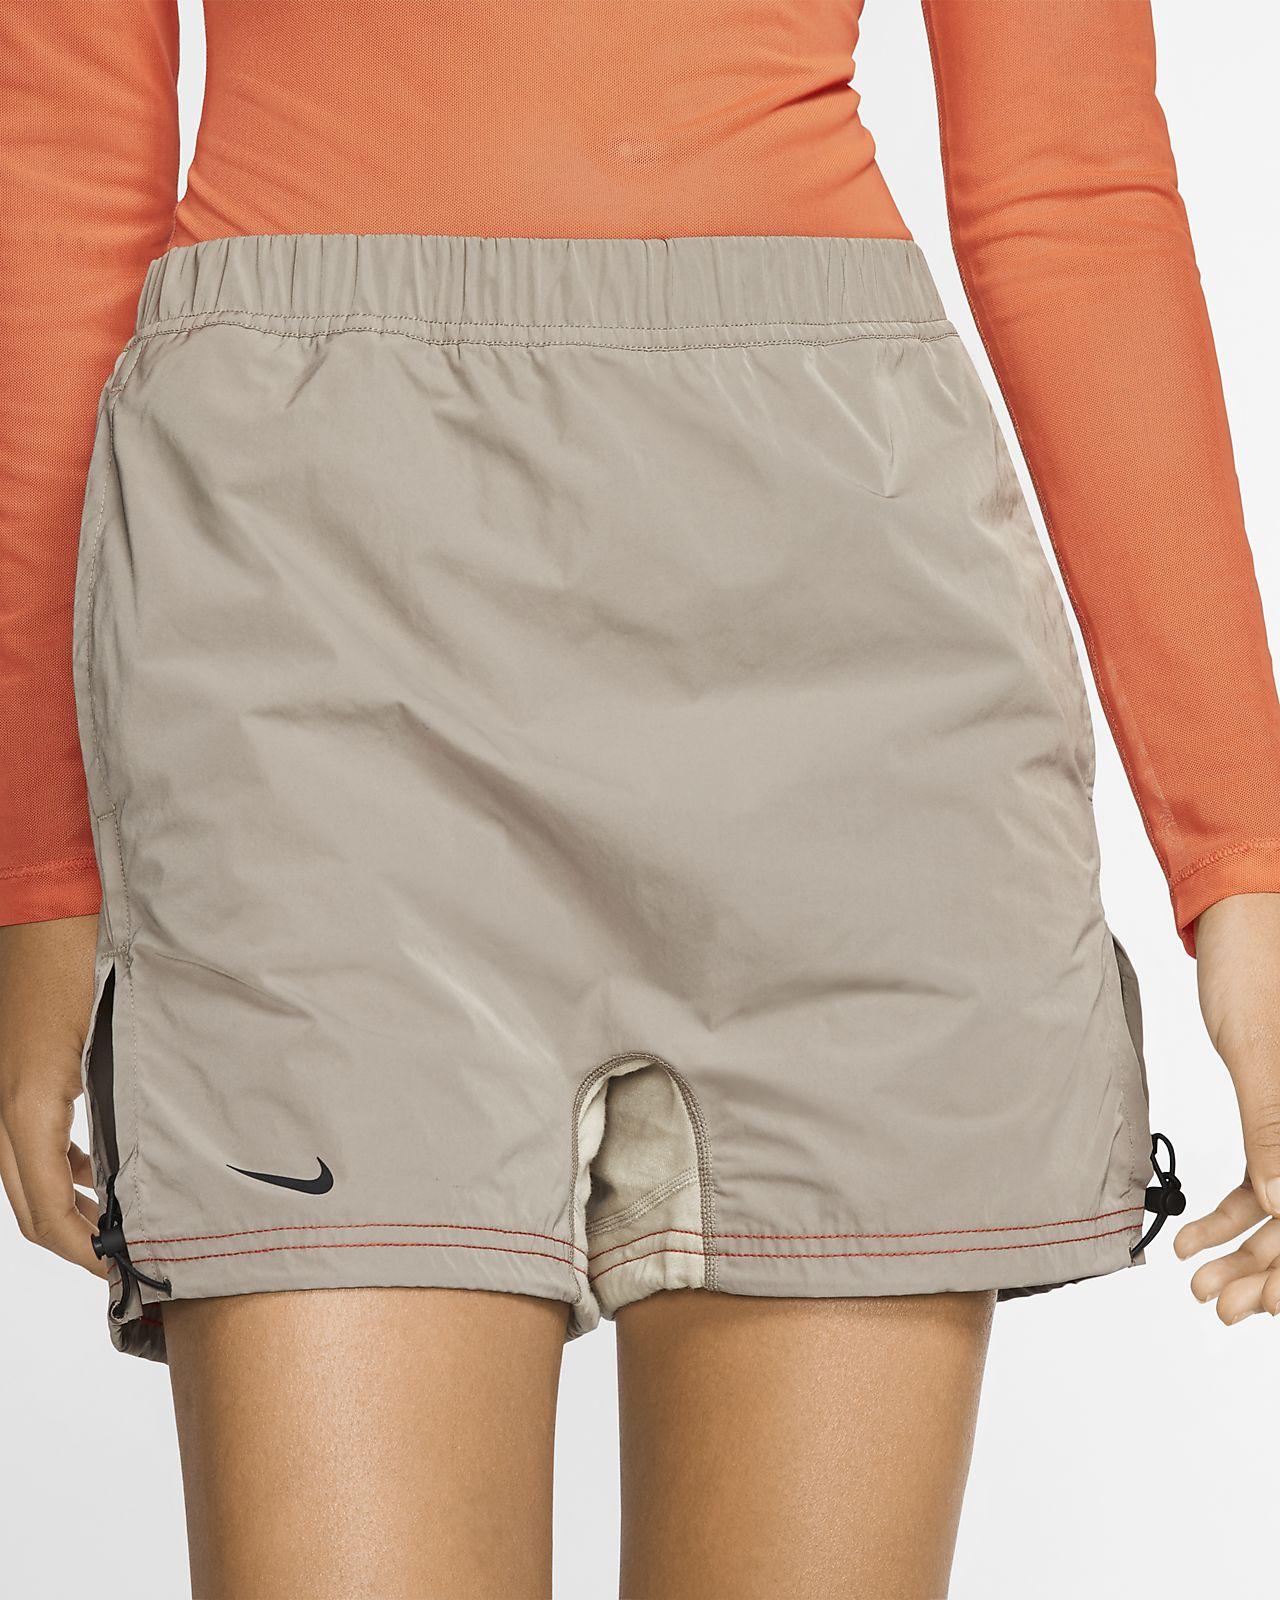 Nike A.A.E. Women's Shorts